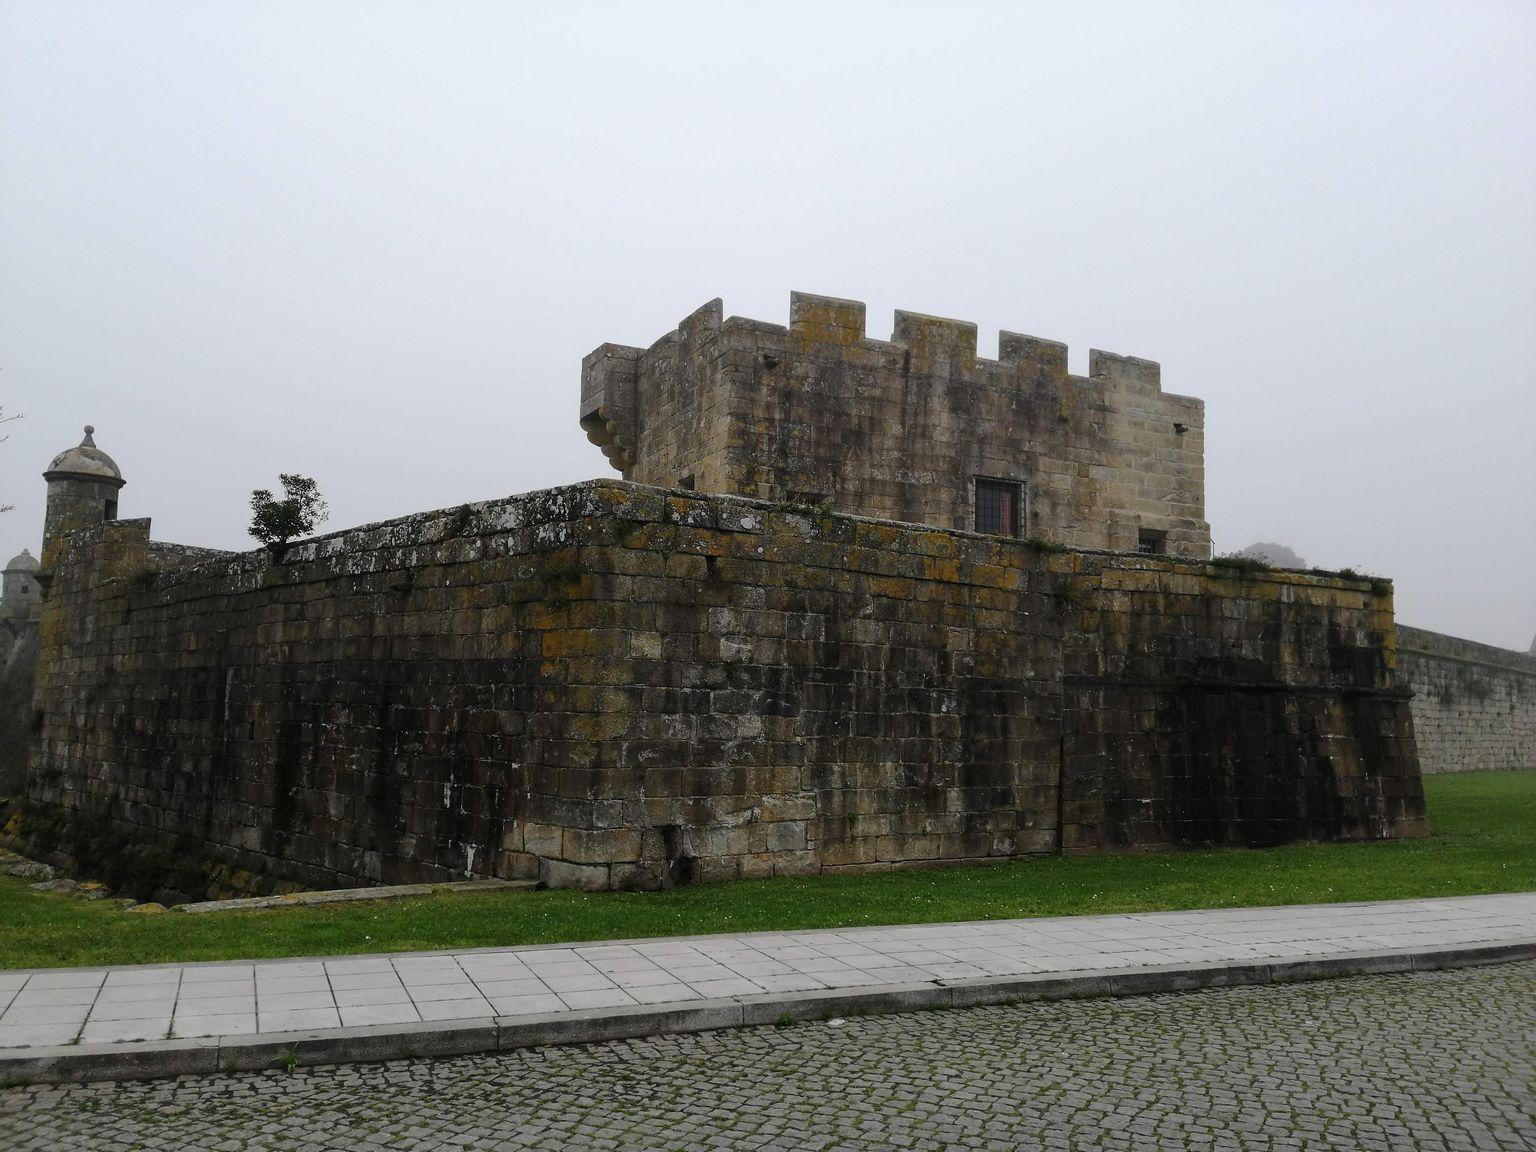 Viana do castelo mars 2020 (26)